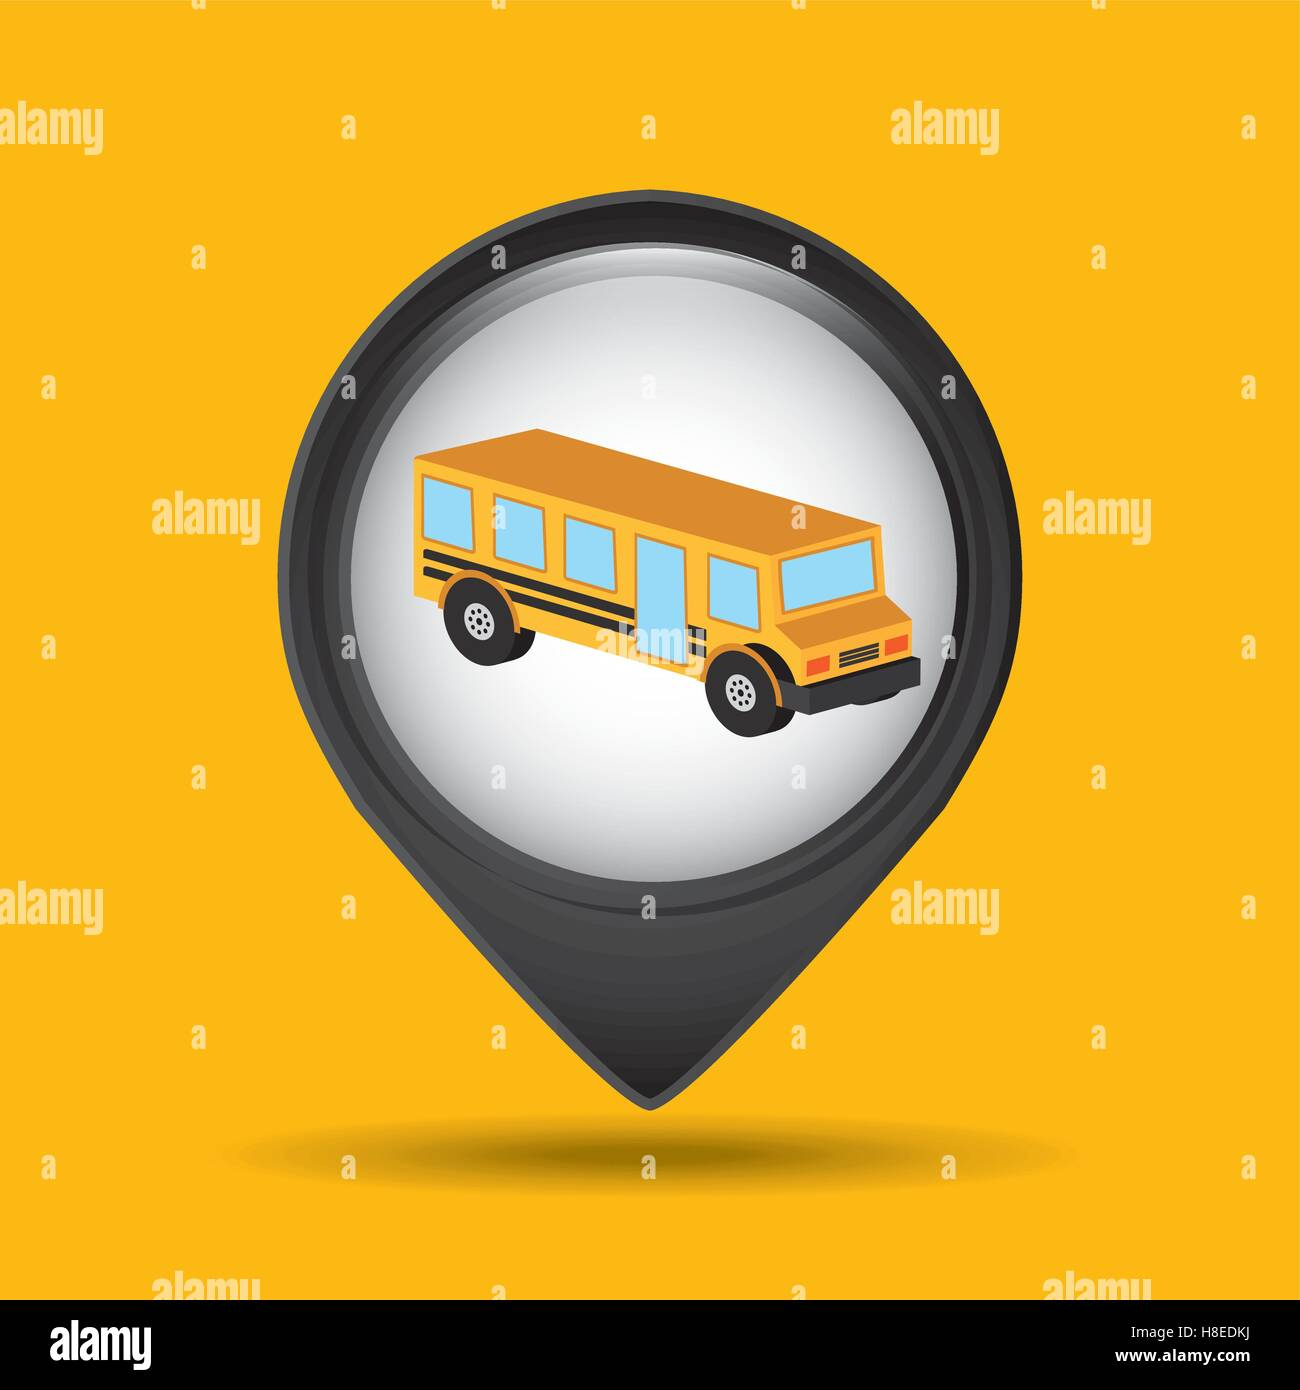 bus yellow school icon design vector illustration eps 10 - Stock Image